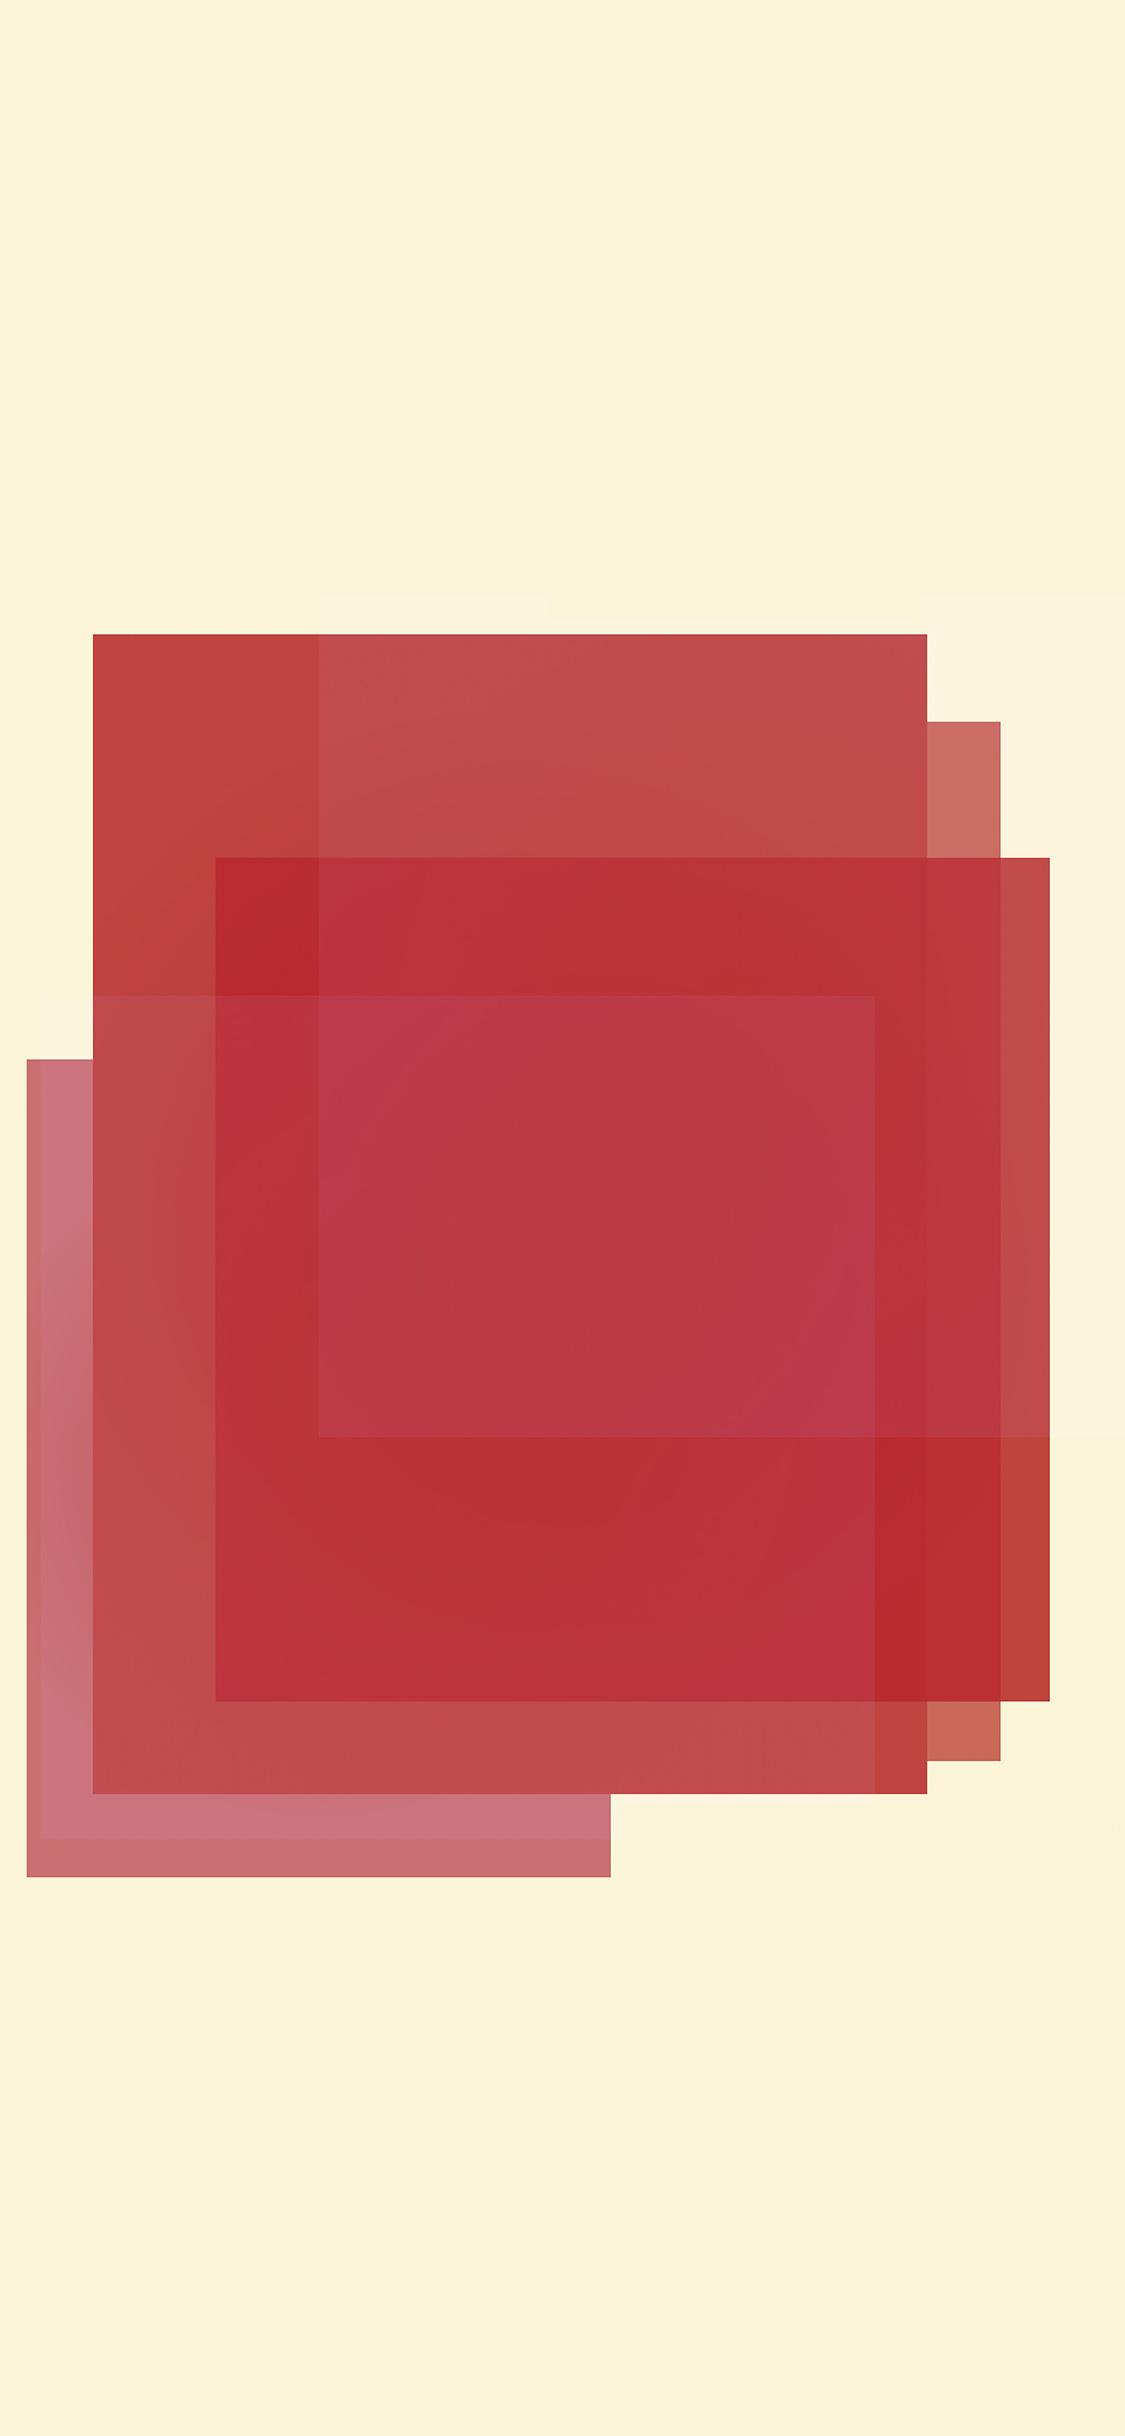 iPhoneXpapers.com-Apple-iPhone-wallpaper-ao39-poster-red-blocks-art-minimal-simple